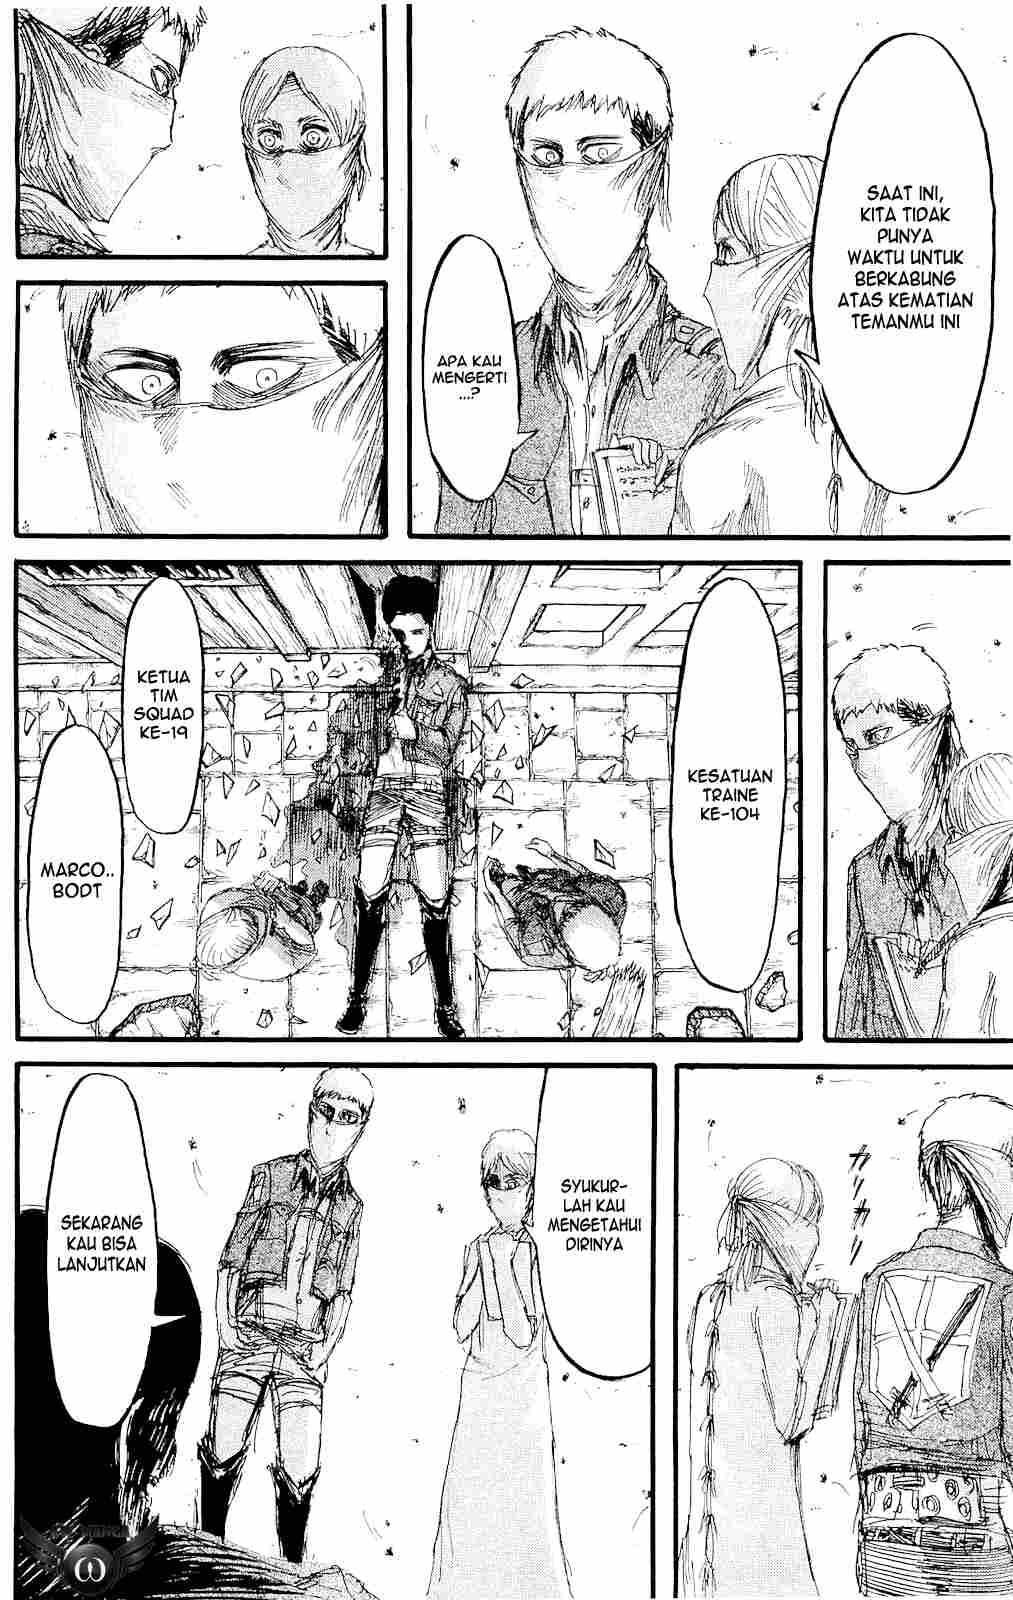 Komik shingeki no kyojin 018 - sekarang apa yang harus dilakukan 19 Indonesia shingeki no kyojin 018 - sekarang apa yang harus dilakukan Terbaru 21|Baca Manga Komik Indonesia|